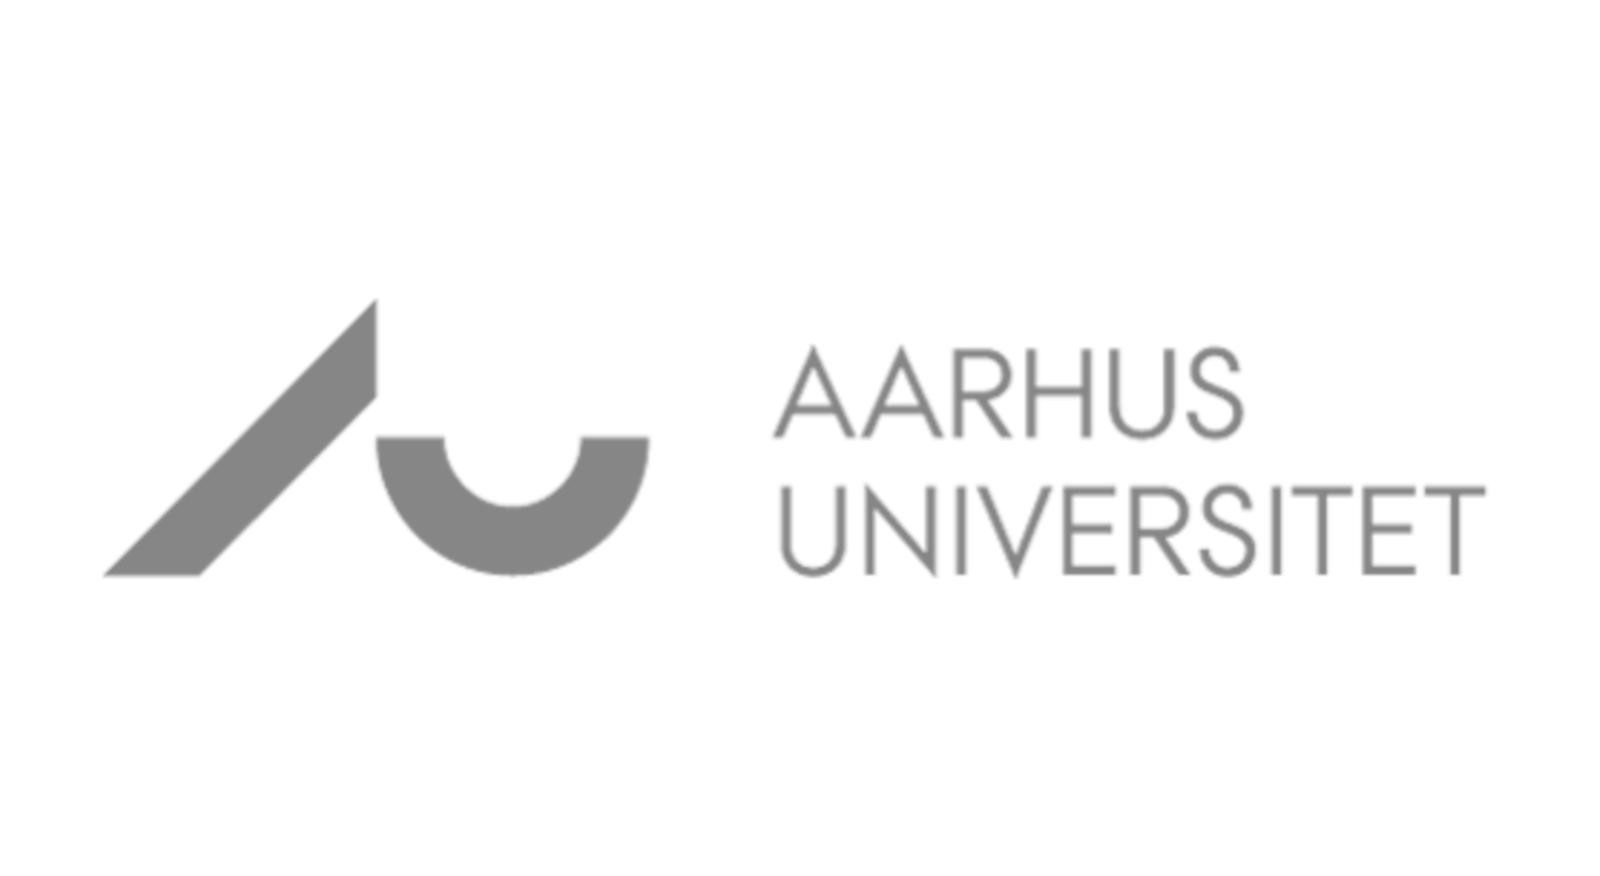 aarhus-universitet-grayscaled